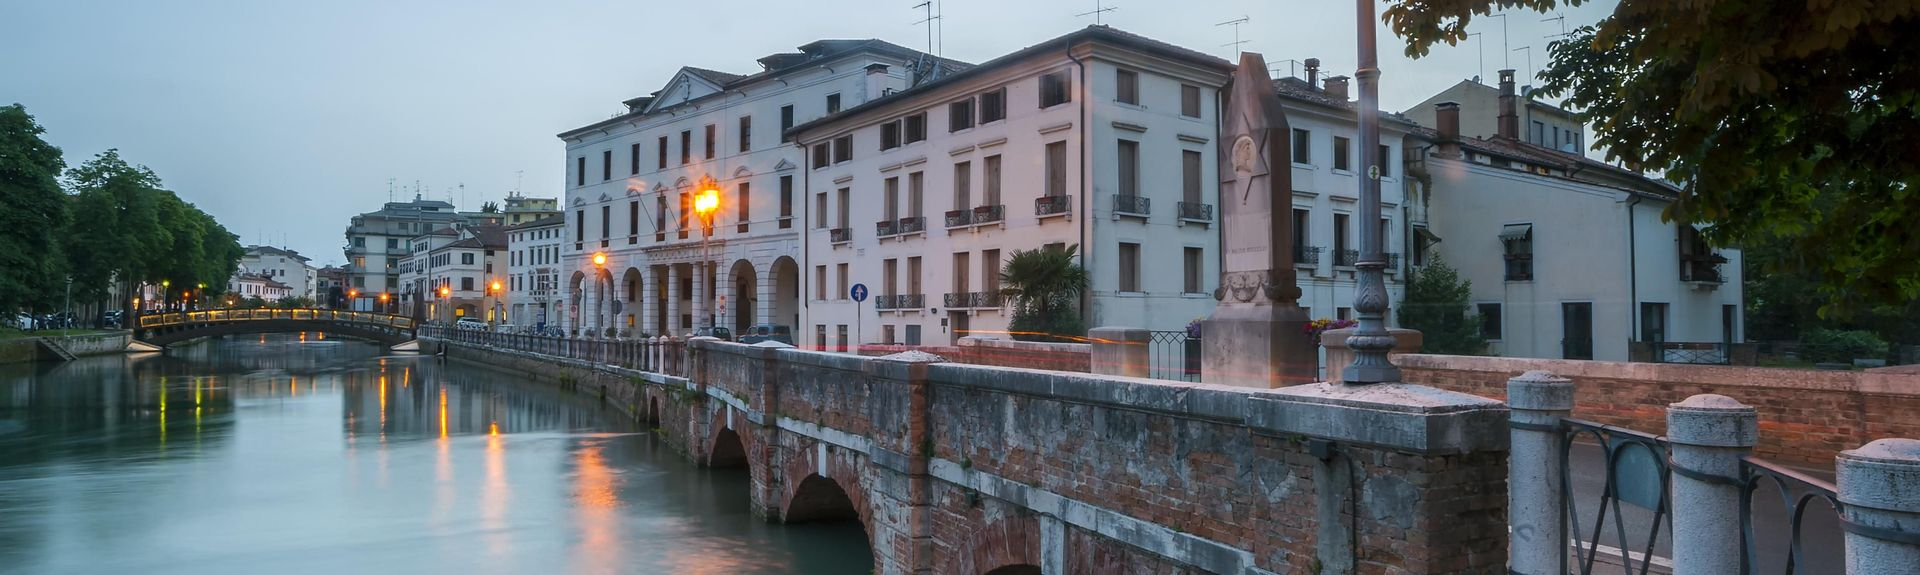 Treviso, Veneto, Italië